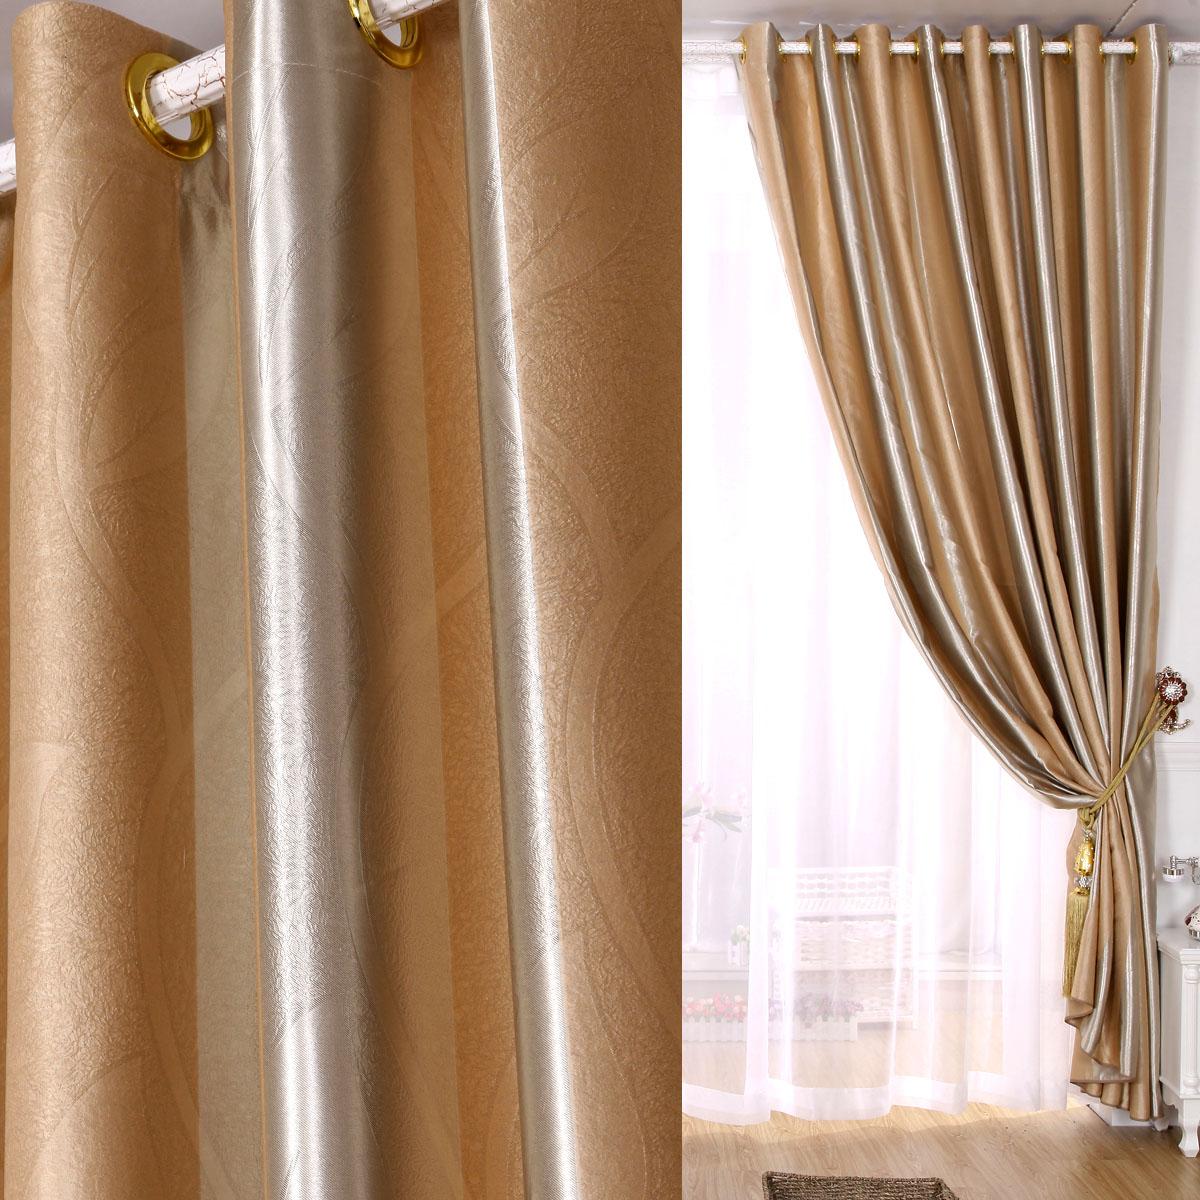 Espessamento dodechedron cortina pano terminou cortina de sombra tecido cortina de pano(China (Mainland))